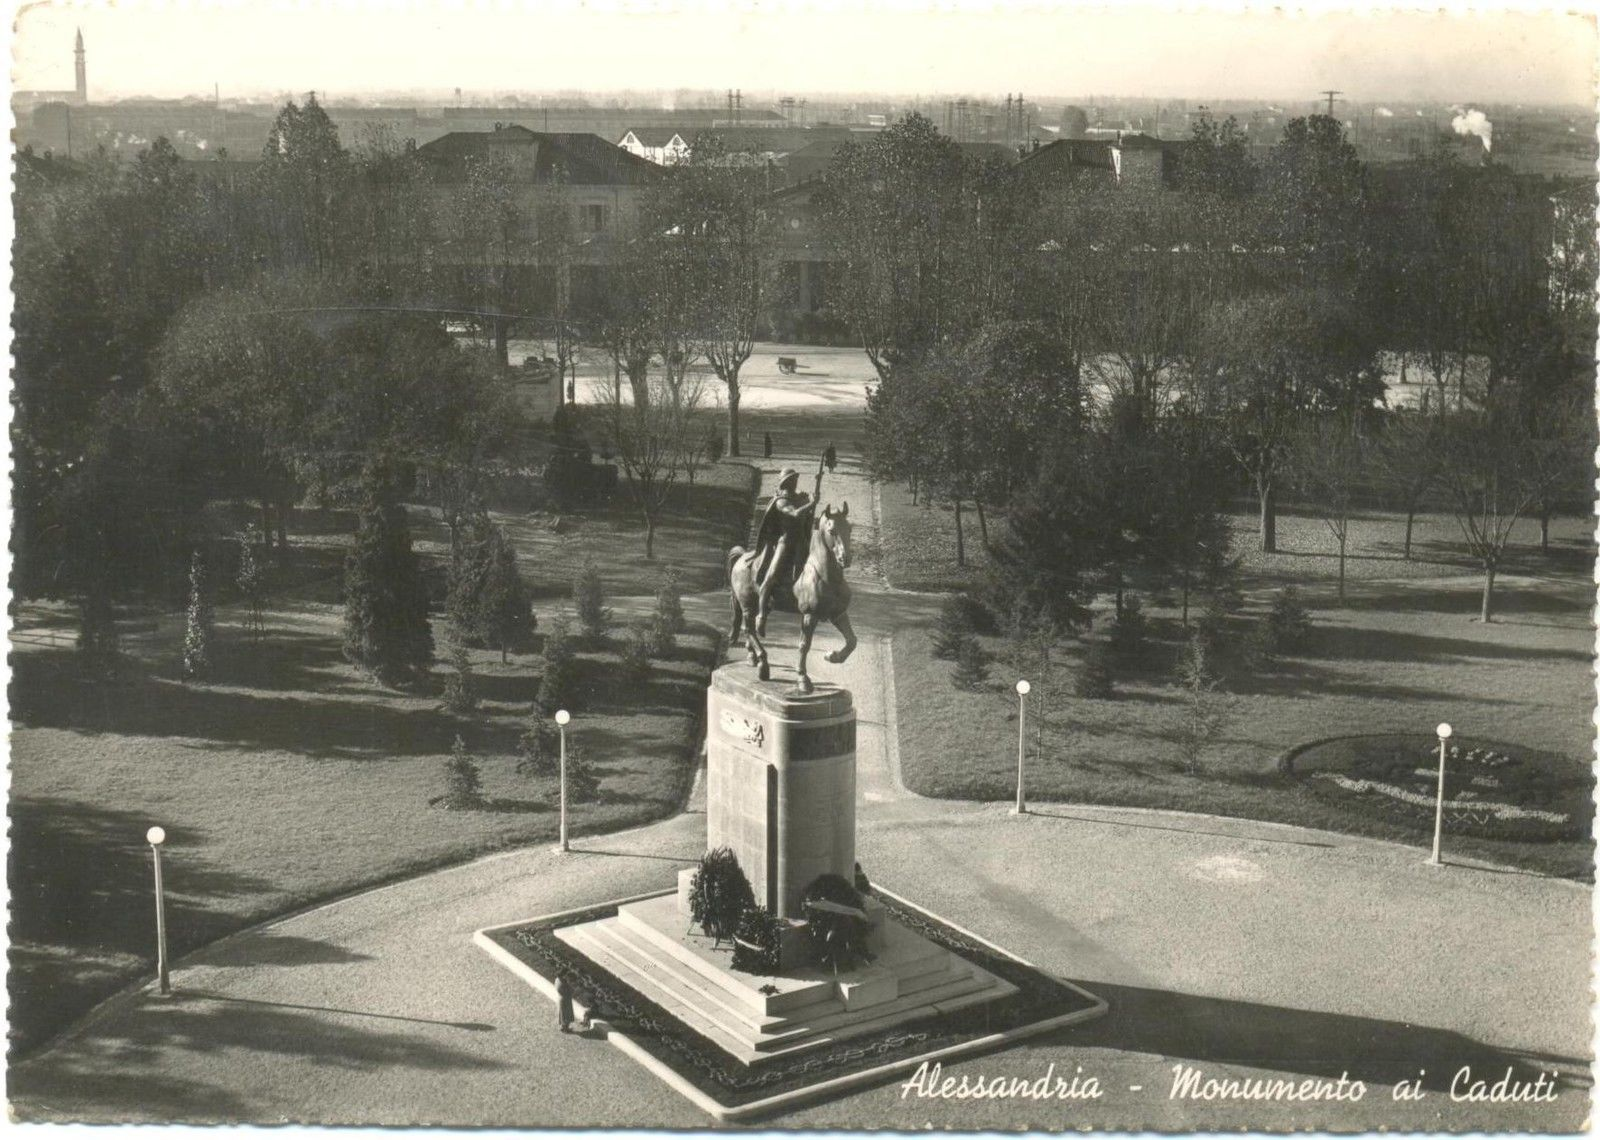 ALESSANDRIA - MONUMENTO AI CADUTI 1940